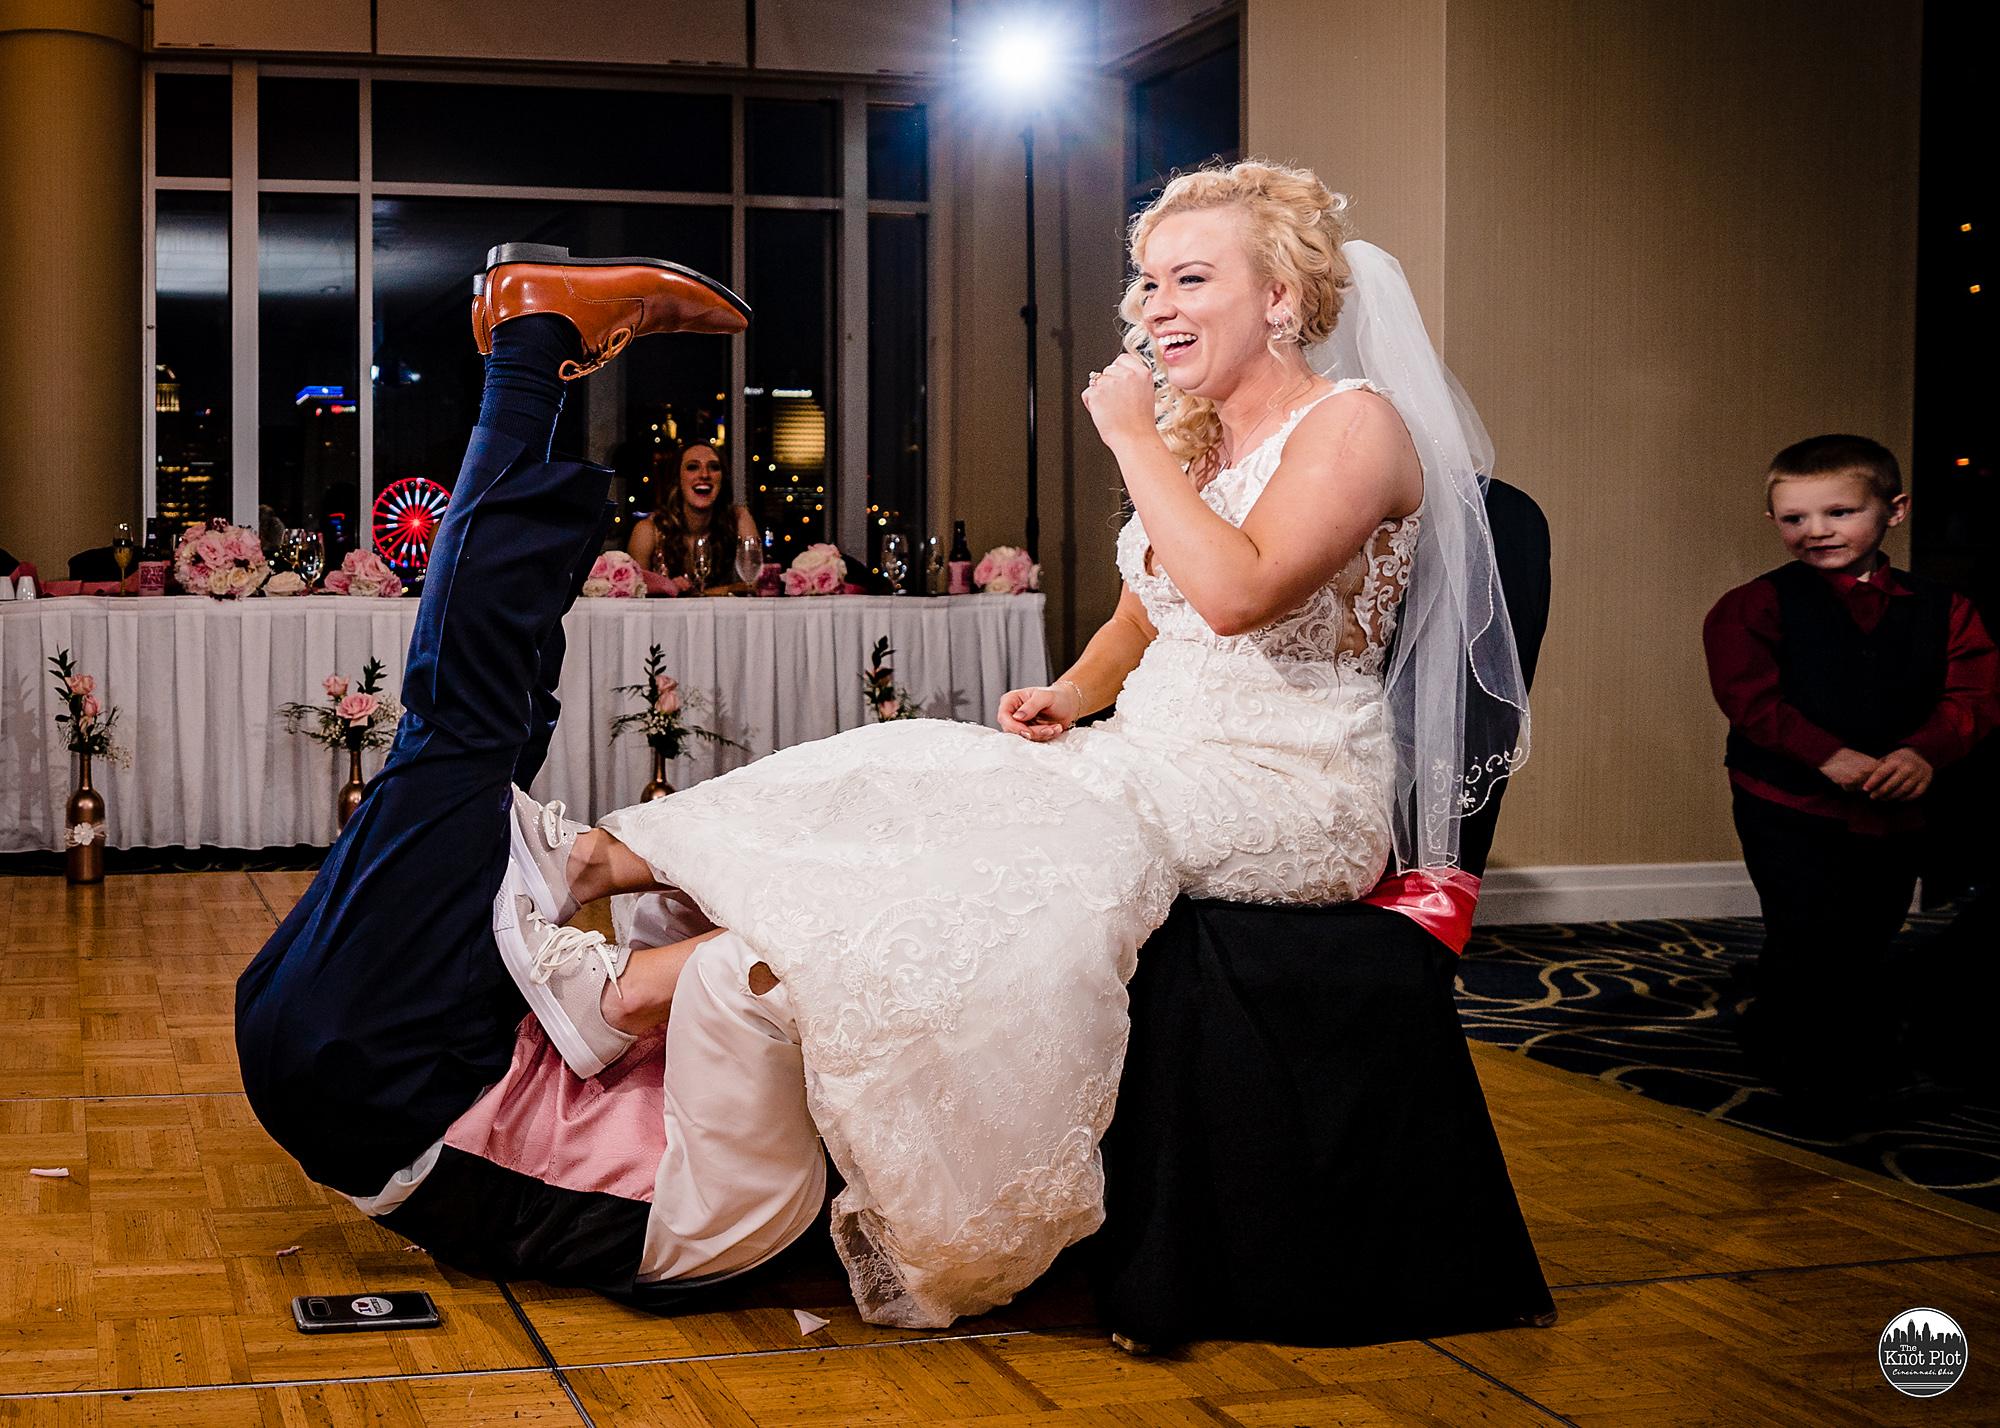 Embassy-Suites-Rivercenter-Cincinnati-Wedding-Photography-32.jpg